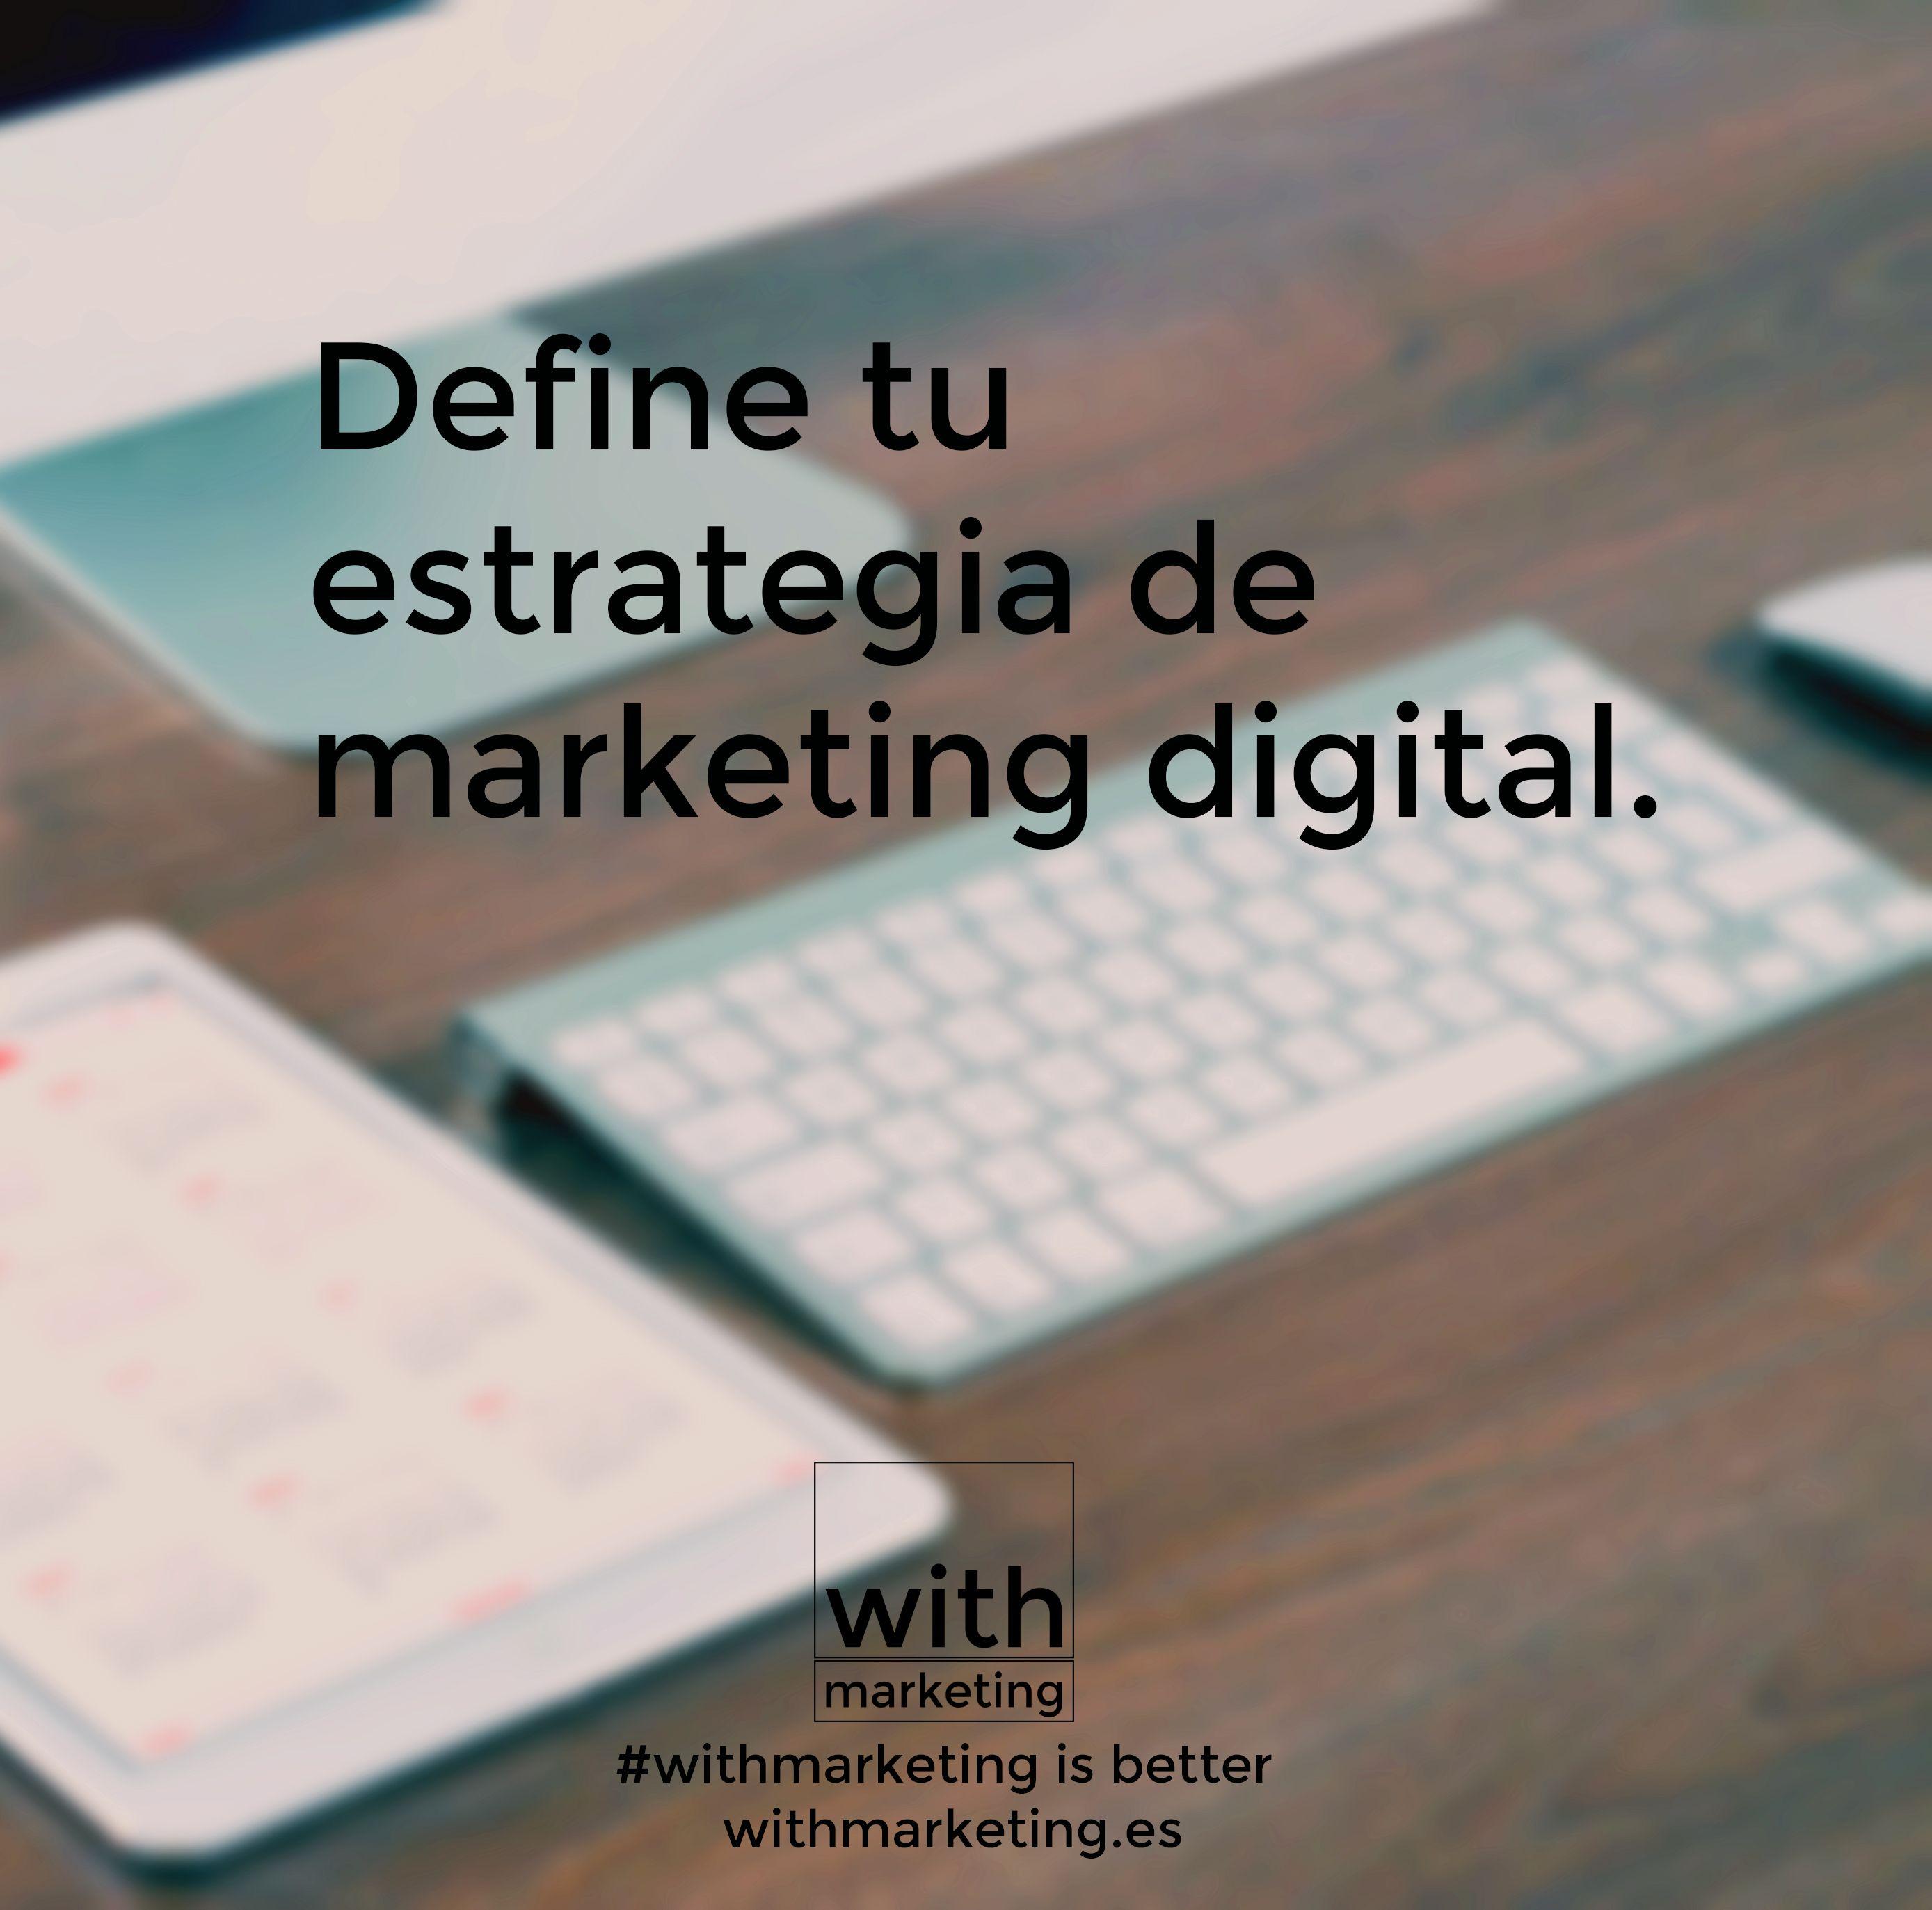 7 pasos importantes para tu Plan de Marketing Digital  #withmarketing #marketing #marketingdigital #web #seo #blog #estrategia #navarra #pamplona #diseño #comunicación #fotografía #vídeo